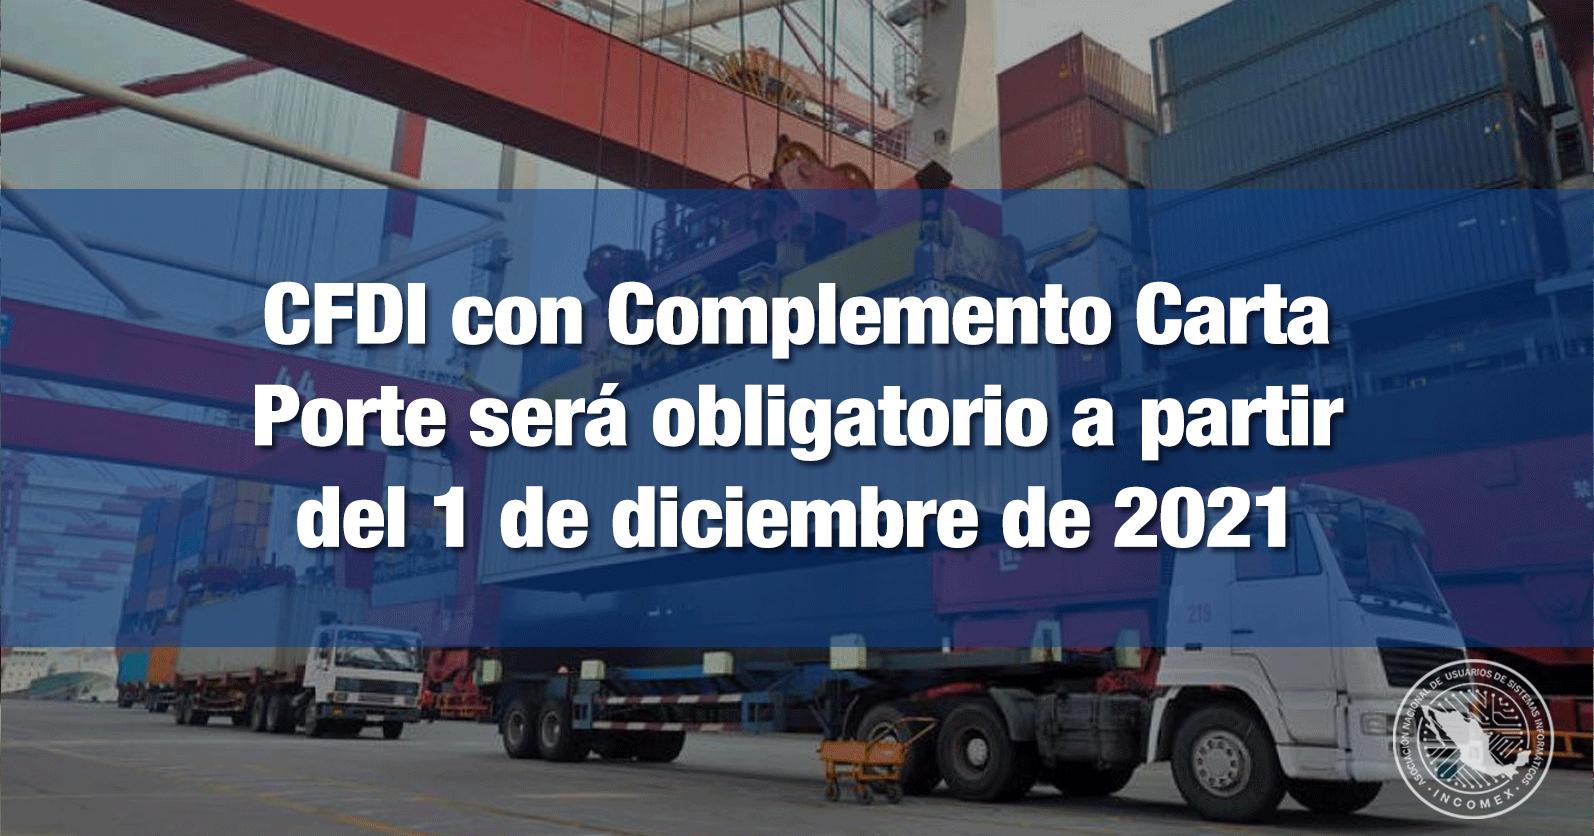 CFDI con Complemento Carta Porte será obligatorio a partir del 1 de diciembre de 2021